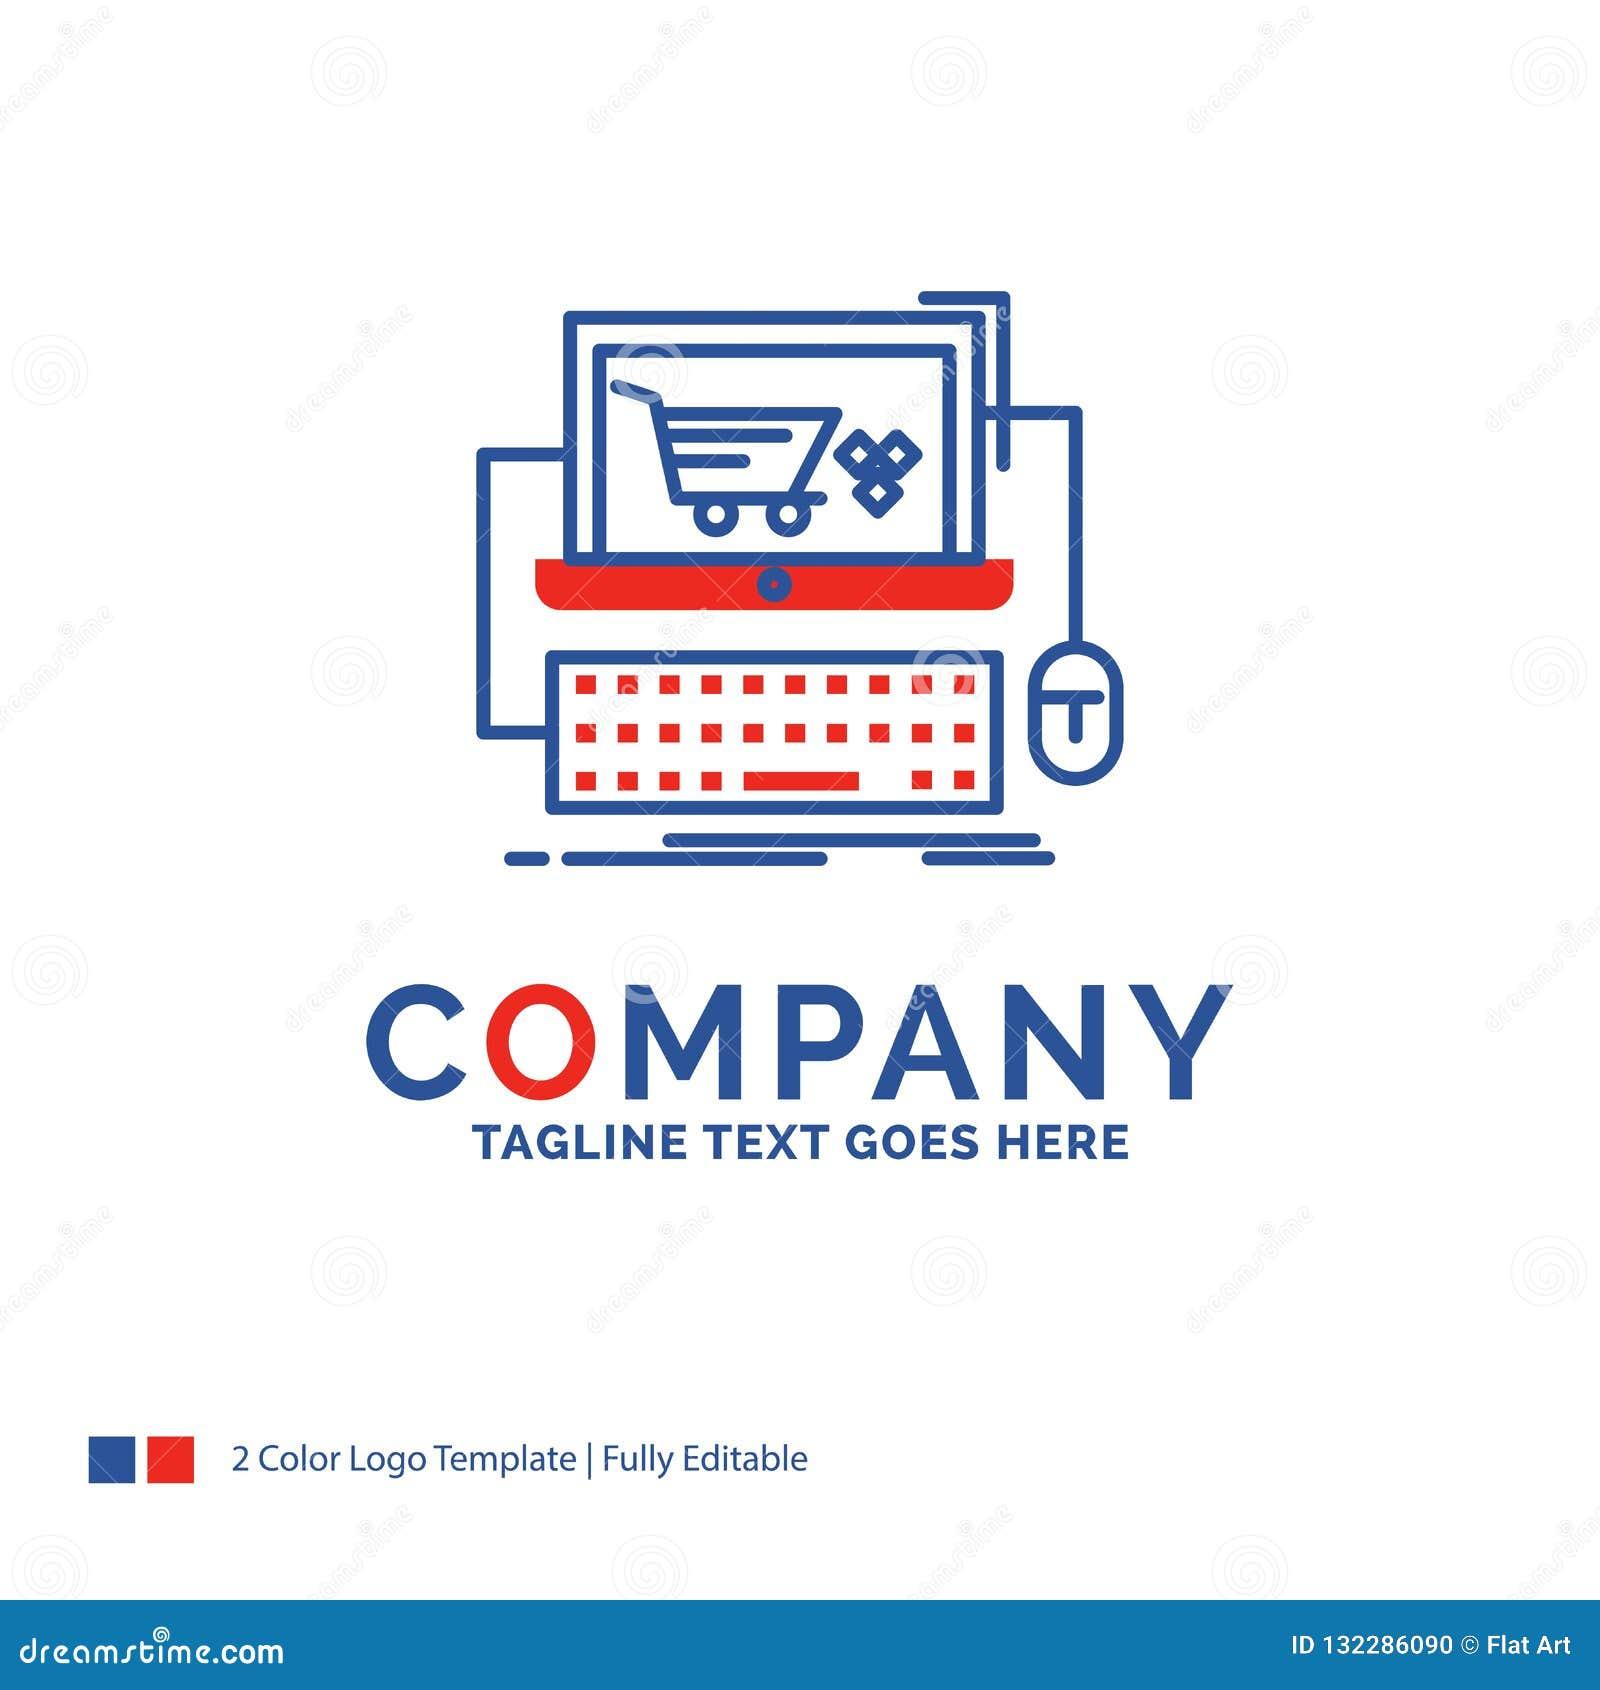 Company Name Logo Design For Cart Online Shop Store Game Bl